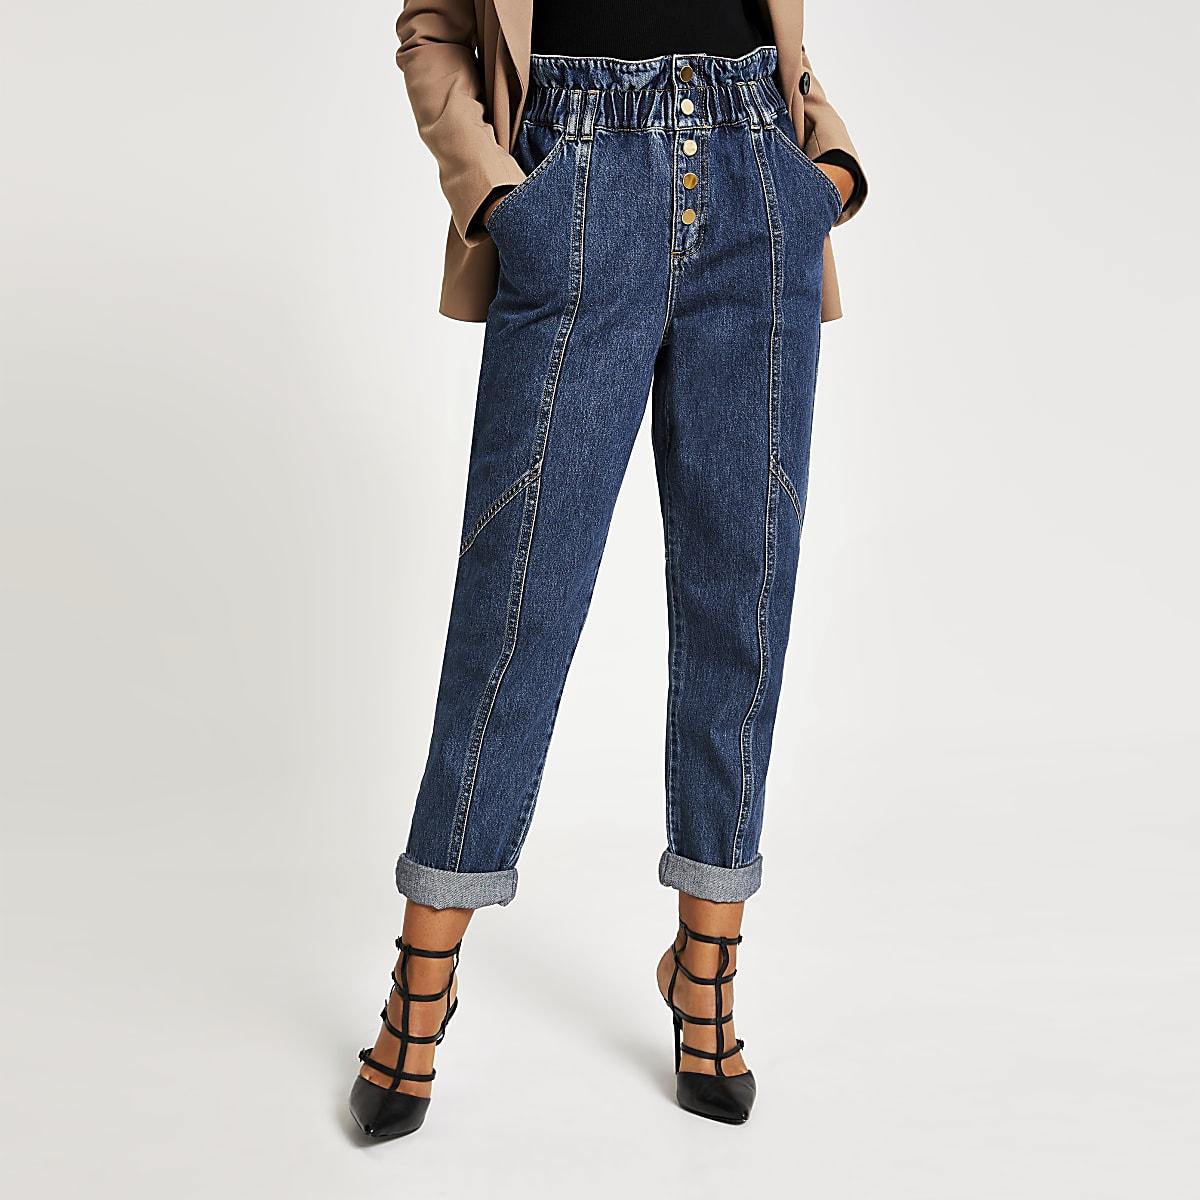 Middenblauwe denim jeans met ingesnoerde taille en knopen voor